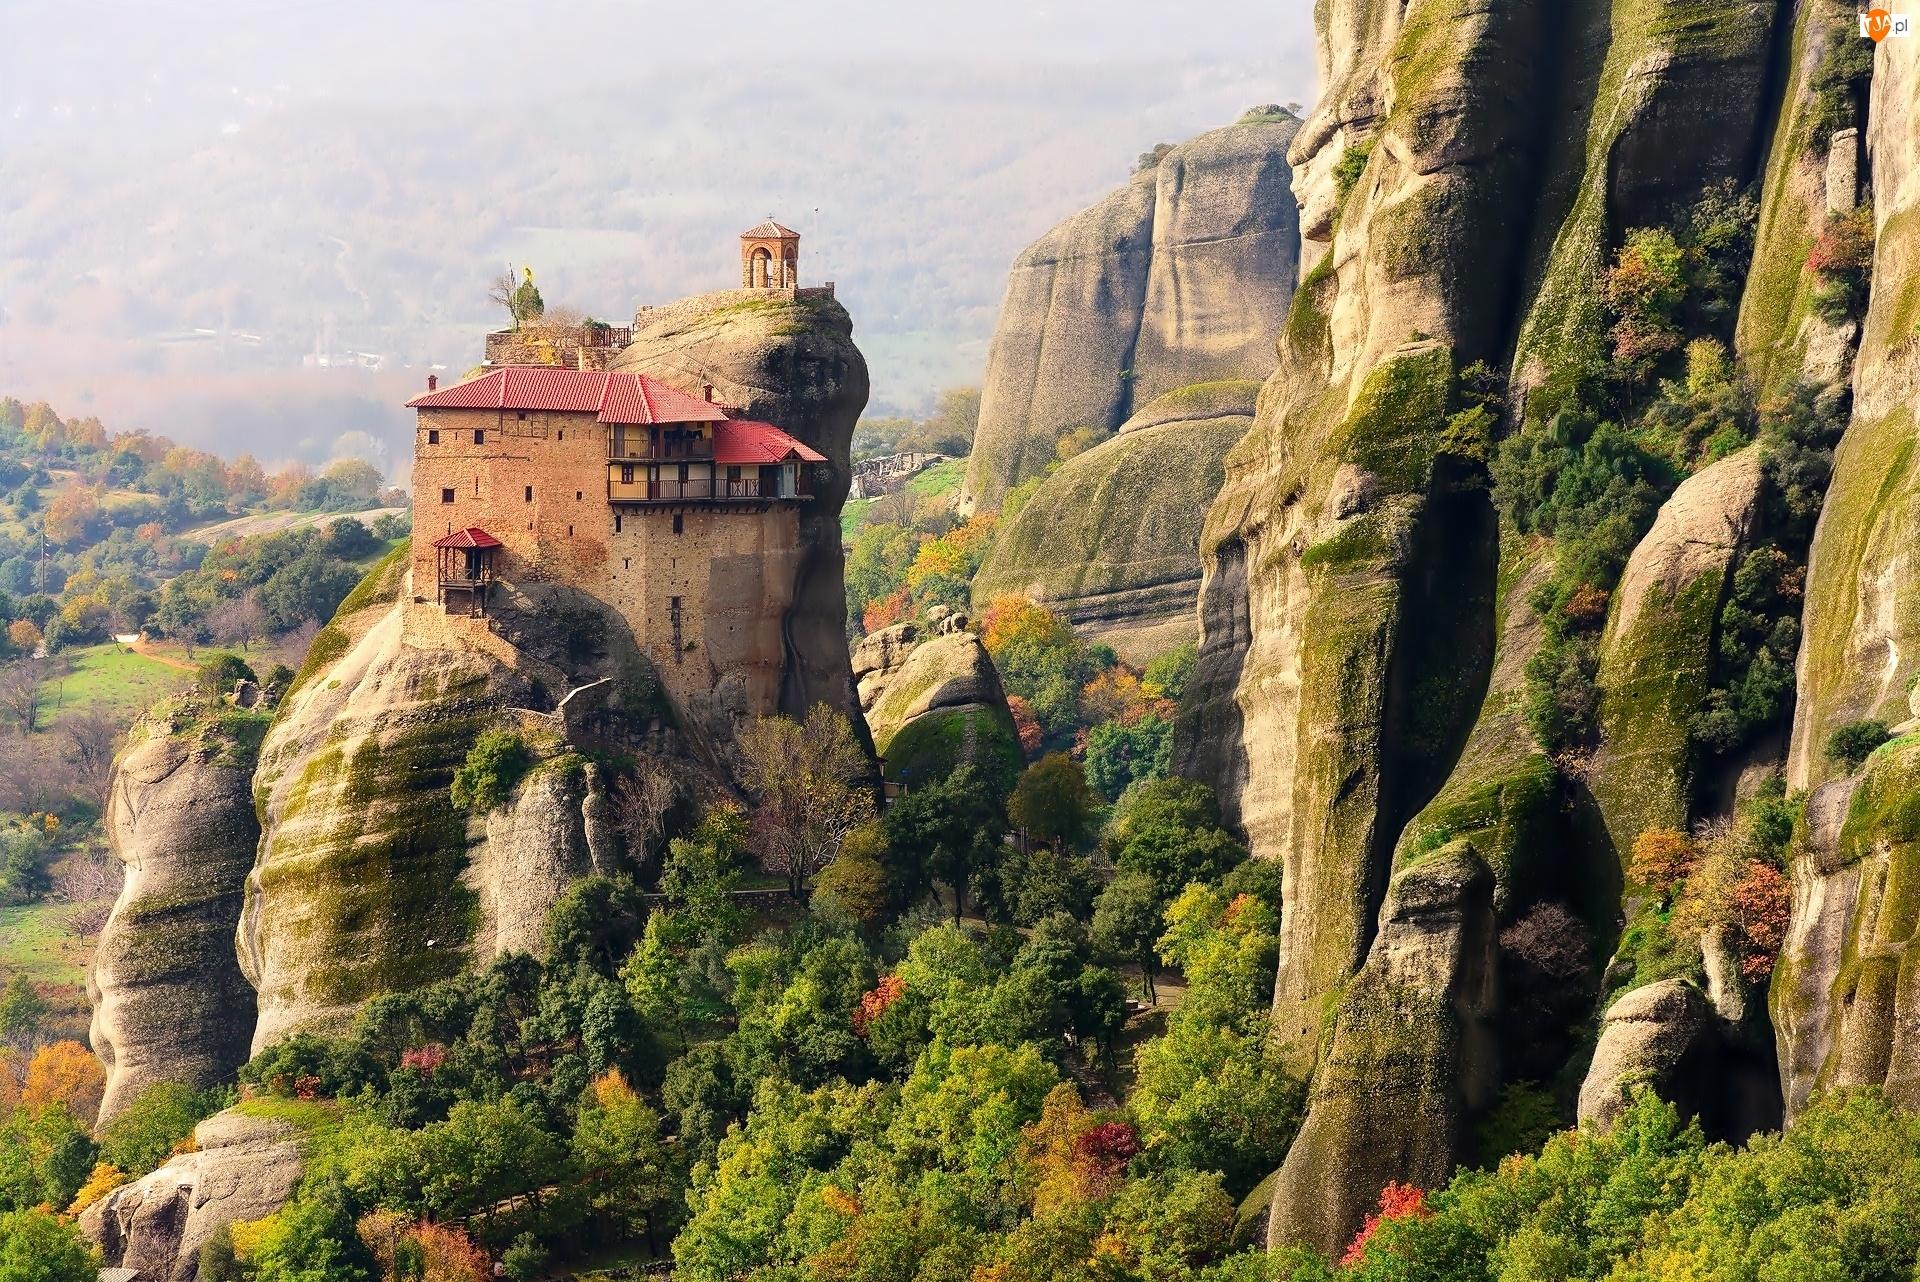 Grecja, Klasztor, Skały